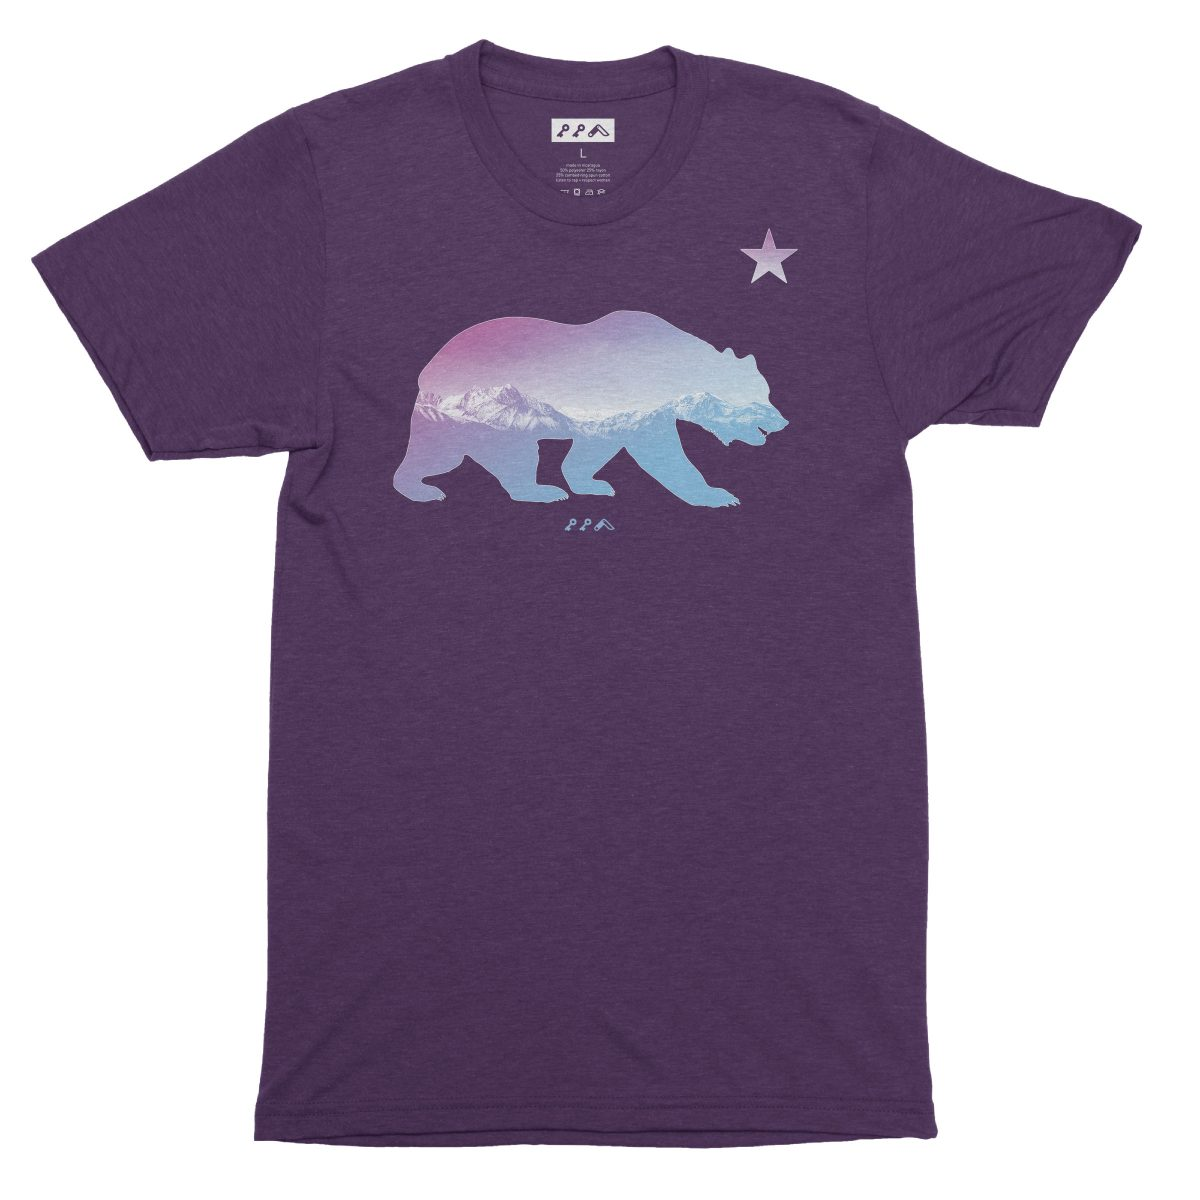 """BARE MOUNTAINS"" california bear t-shirt in purple by kikicutt"